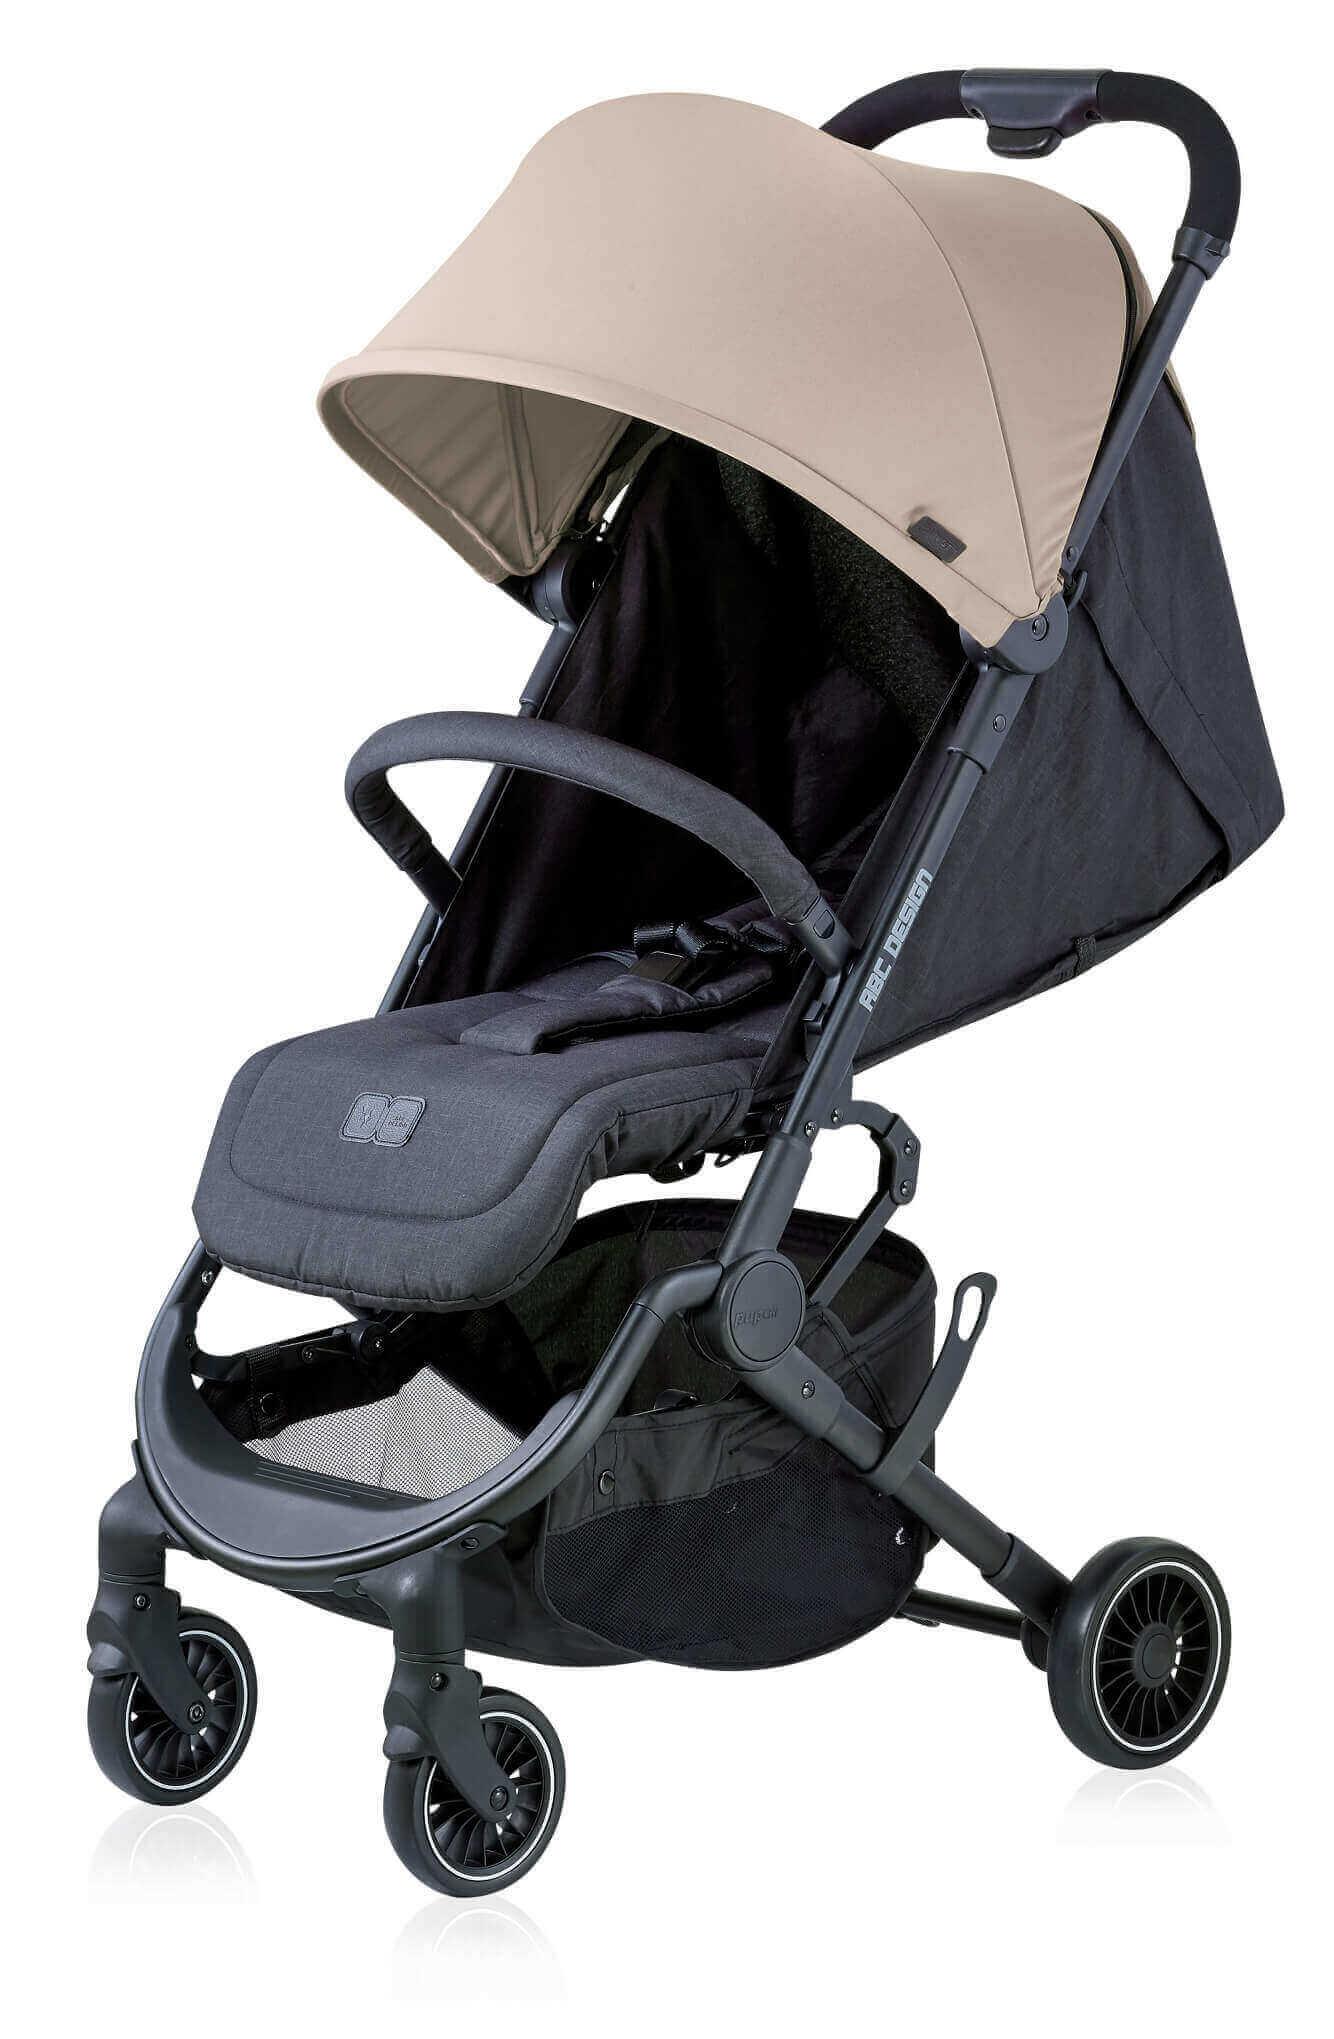 main mobile picture for ABC Design Stroller Pupair Classic Stoller - Kereta Bayi Pup Air Classic